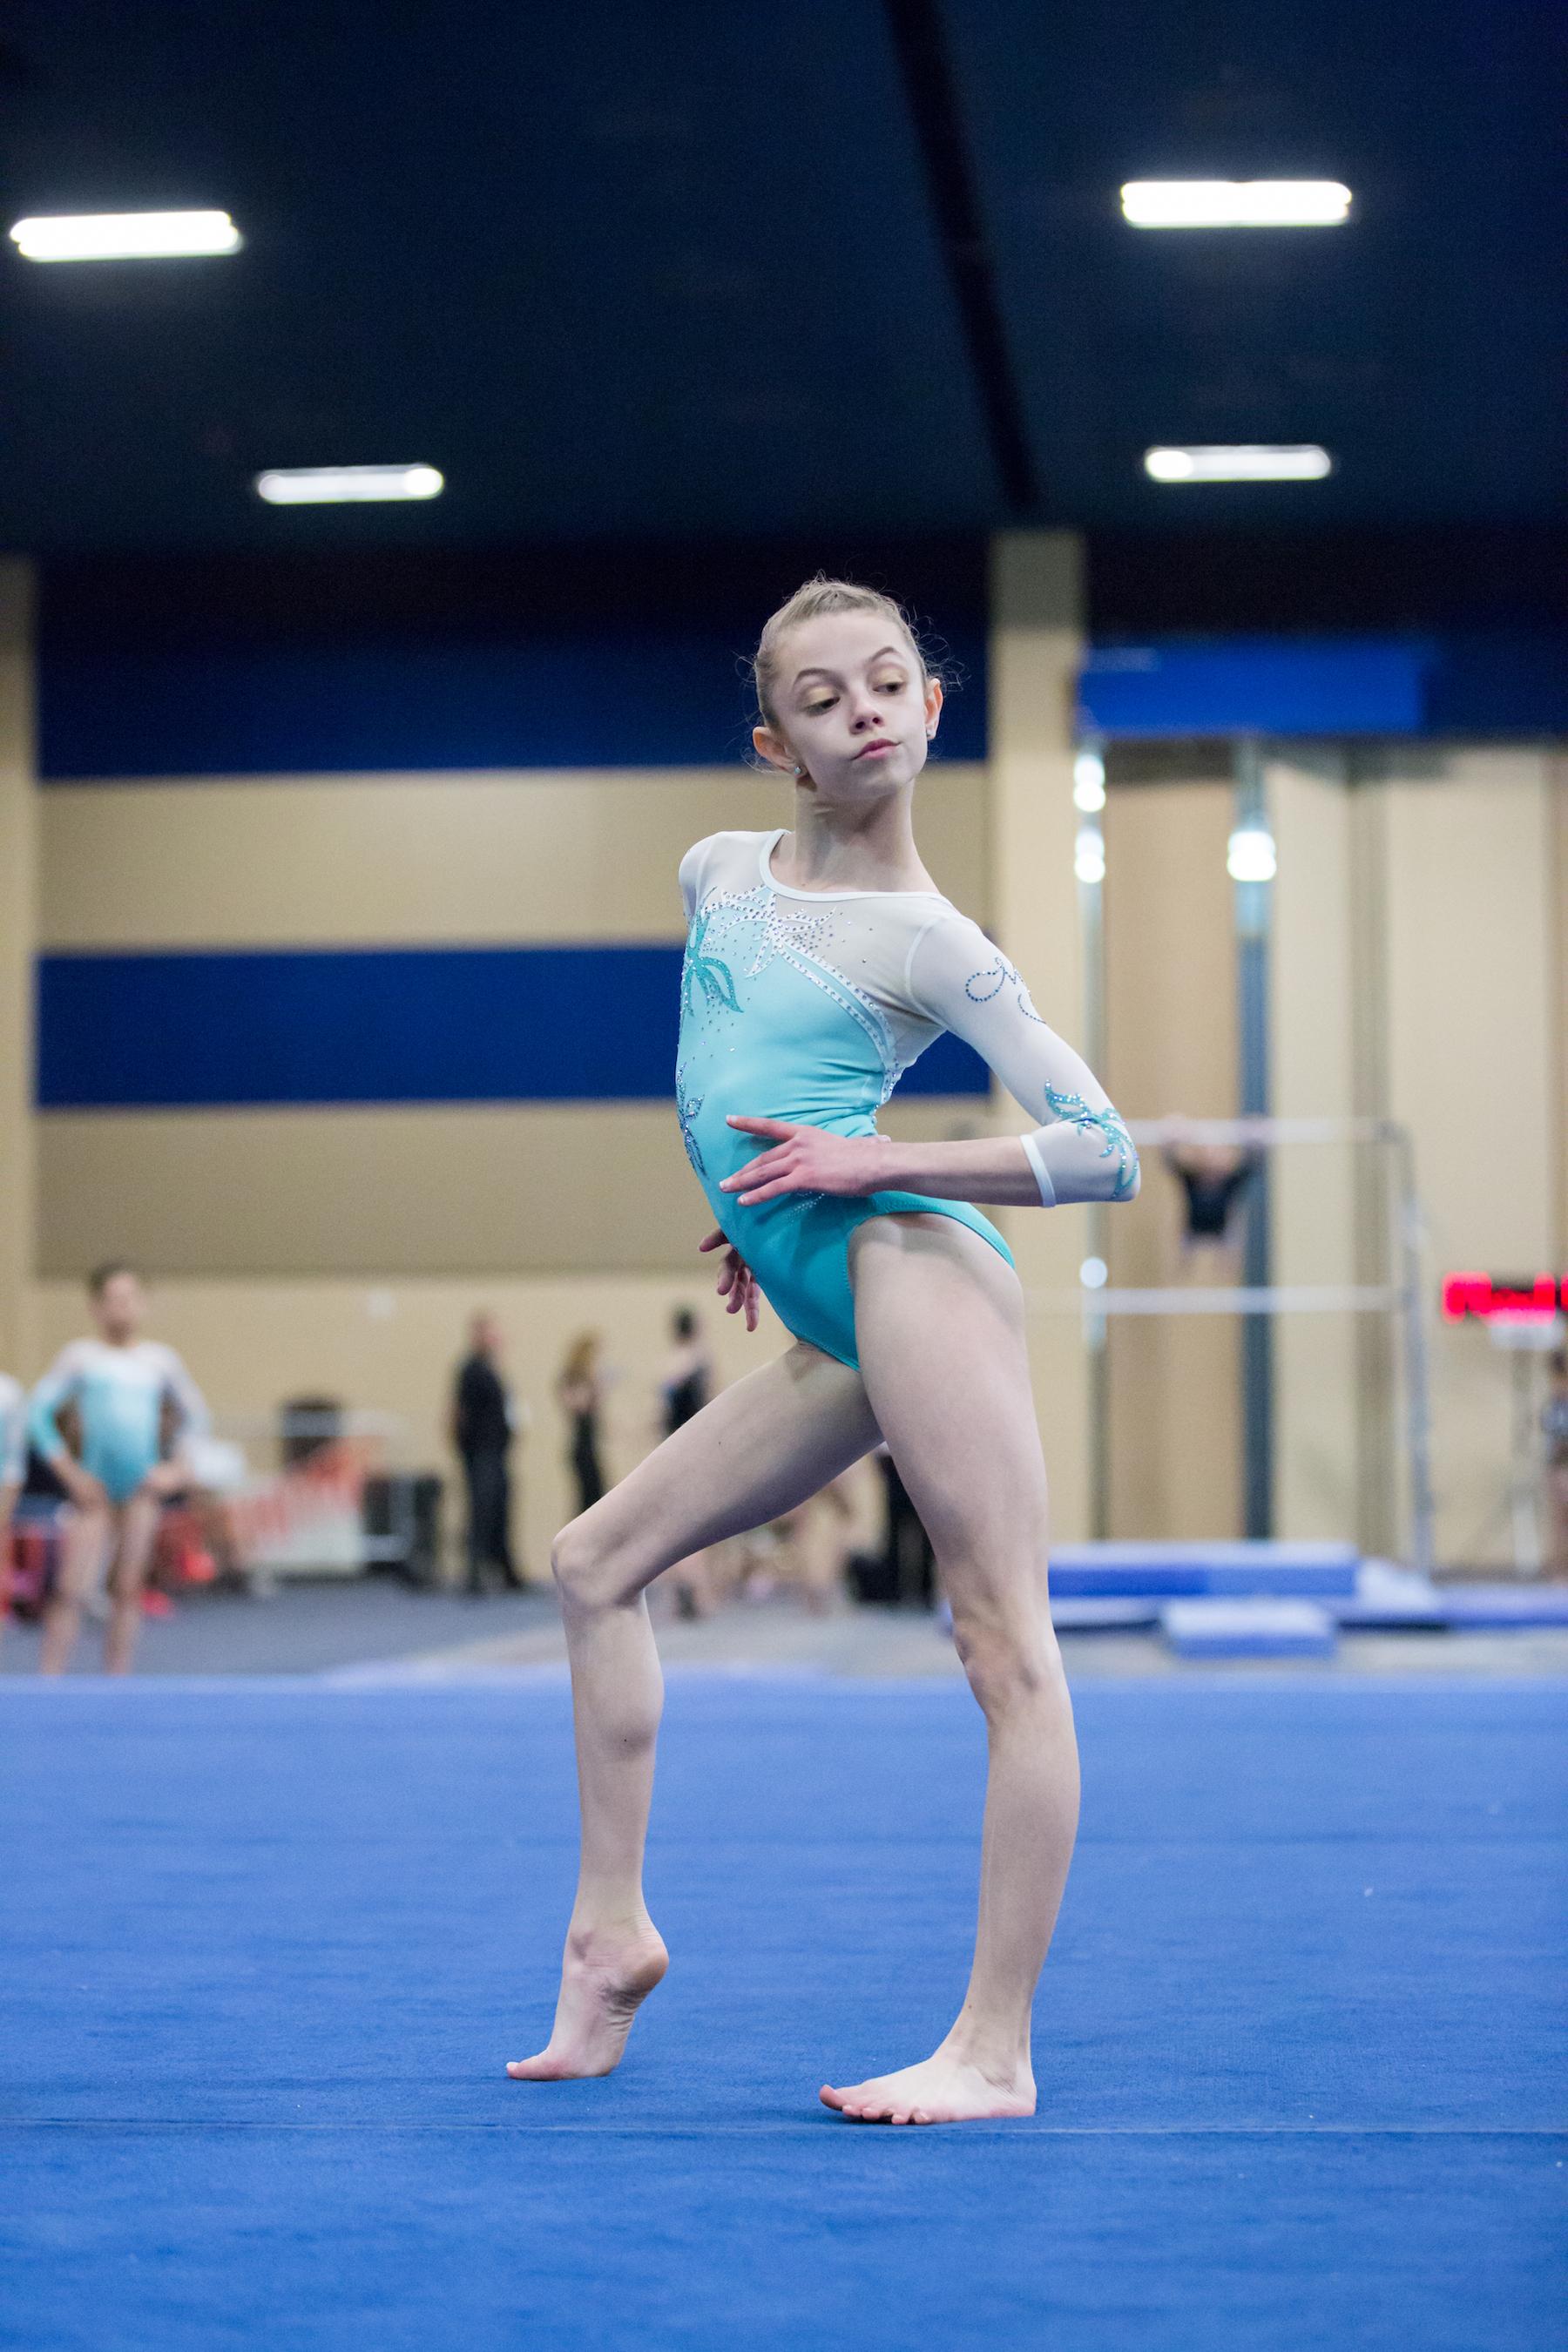 MeetScoresOnline - USA Gymnastics JO Meet Results and Live